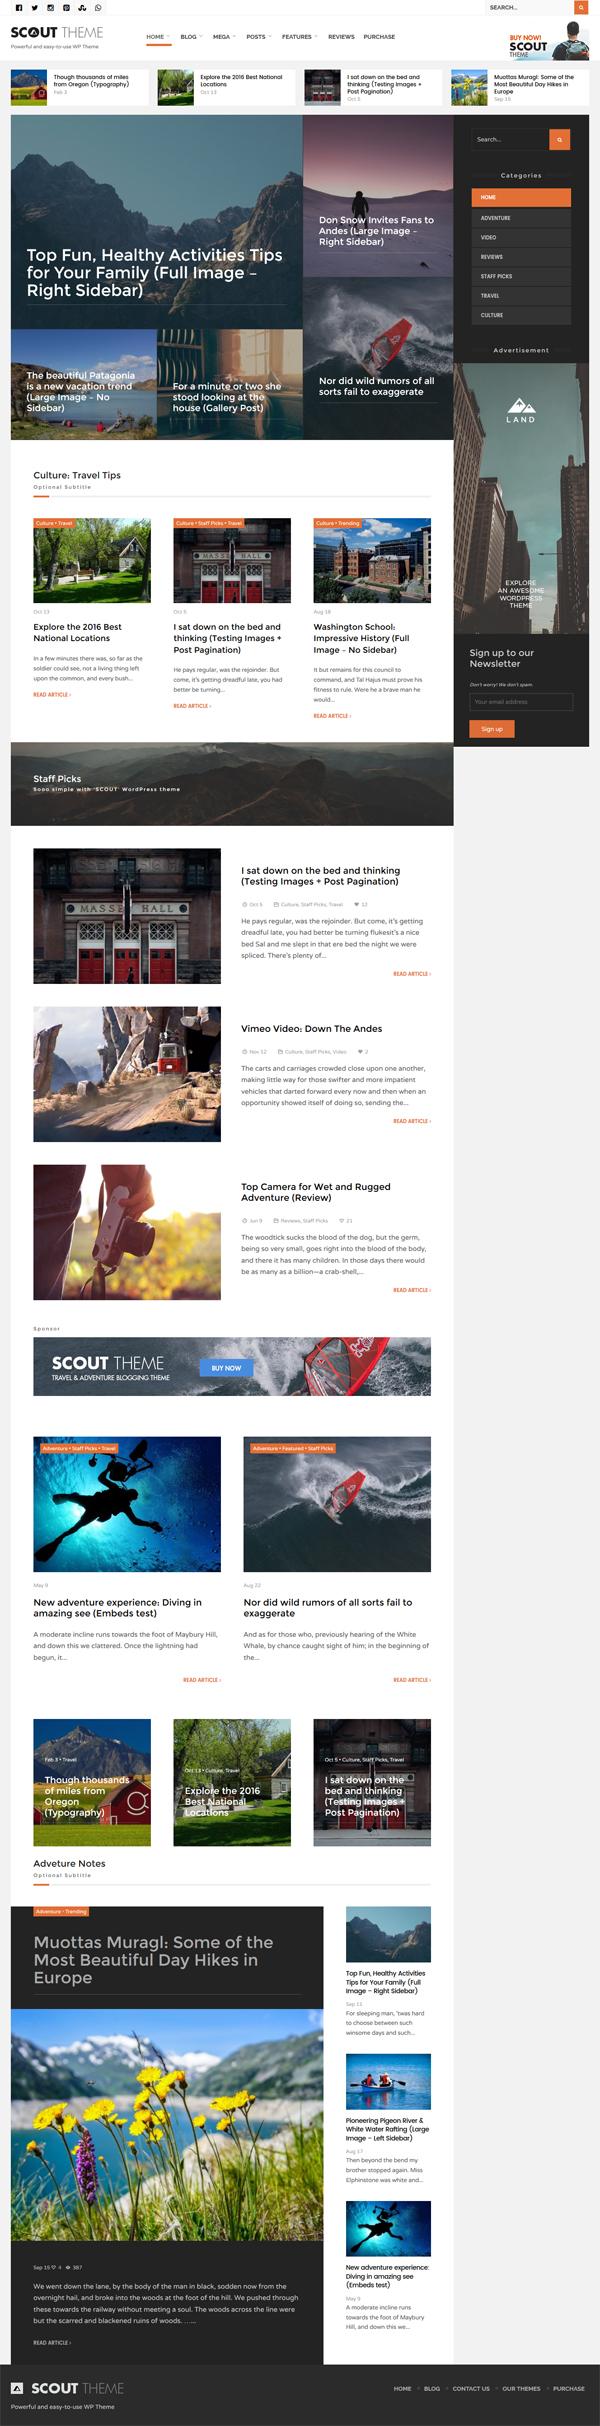 Scout - Adventure / Activity Blog WordPress Theme